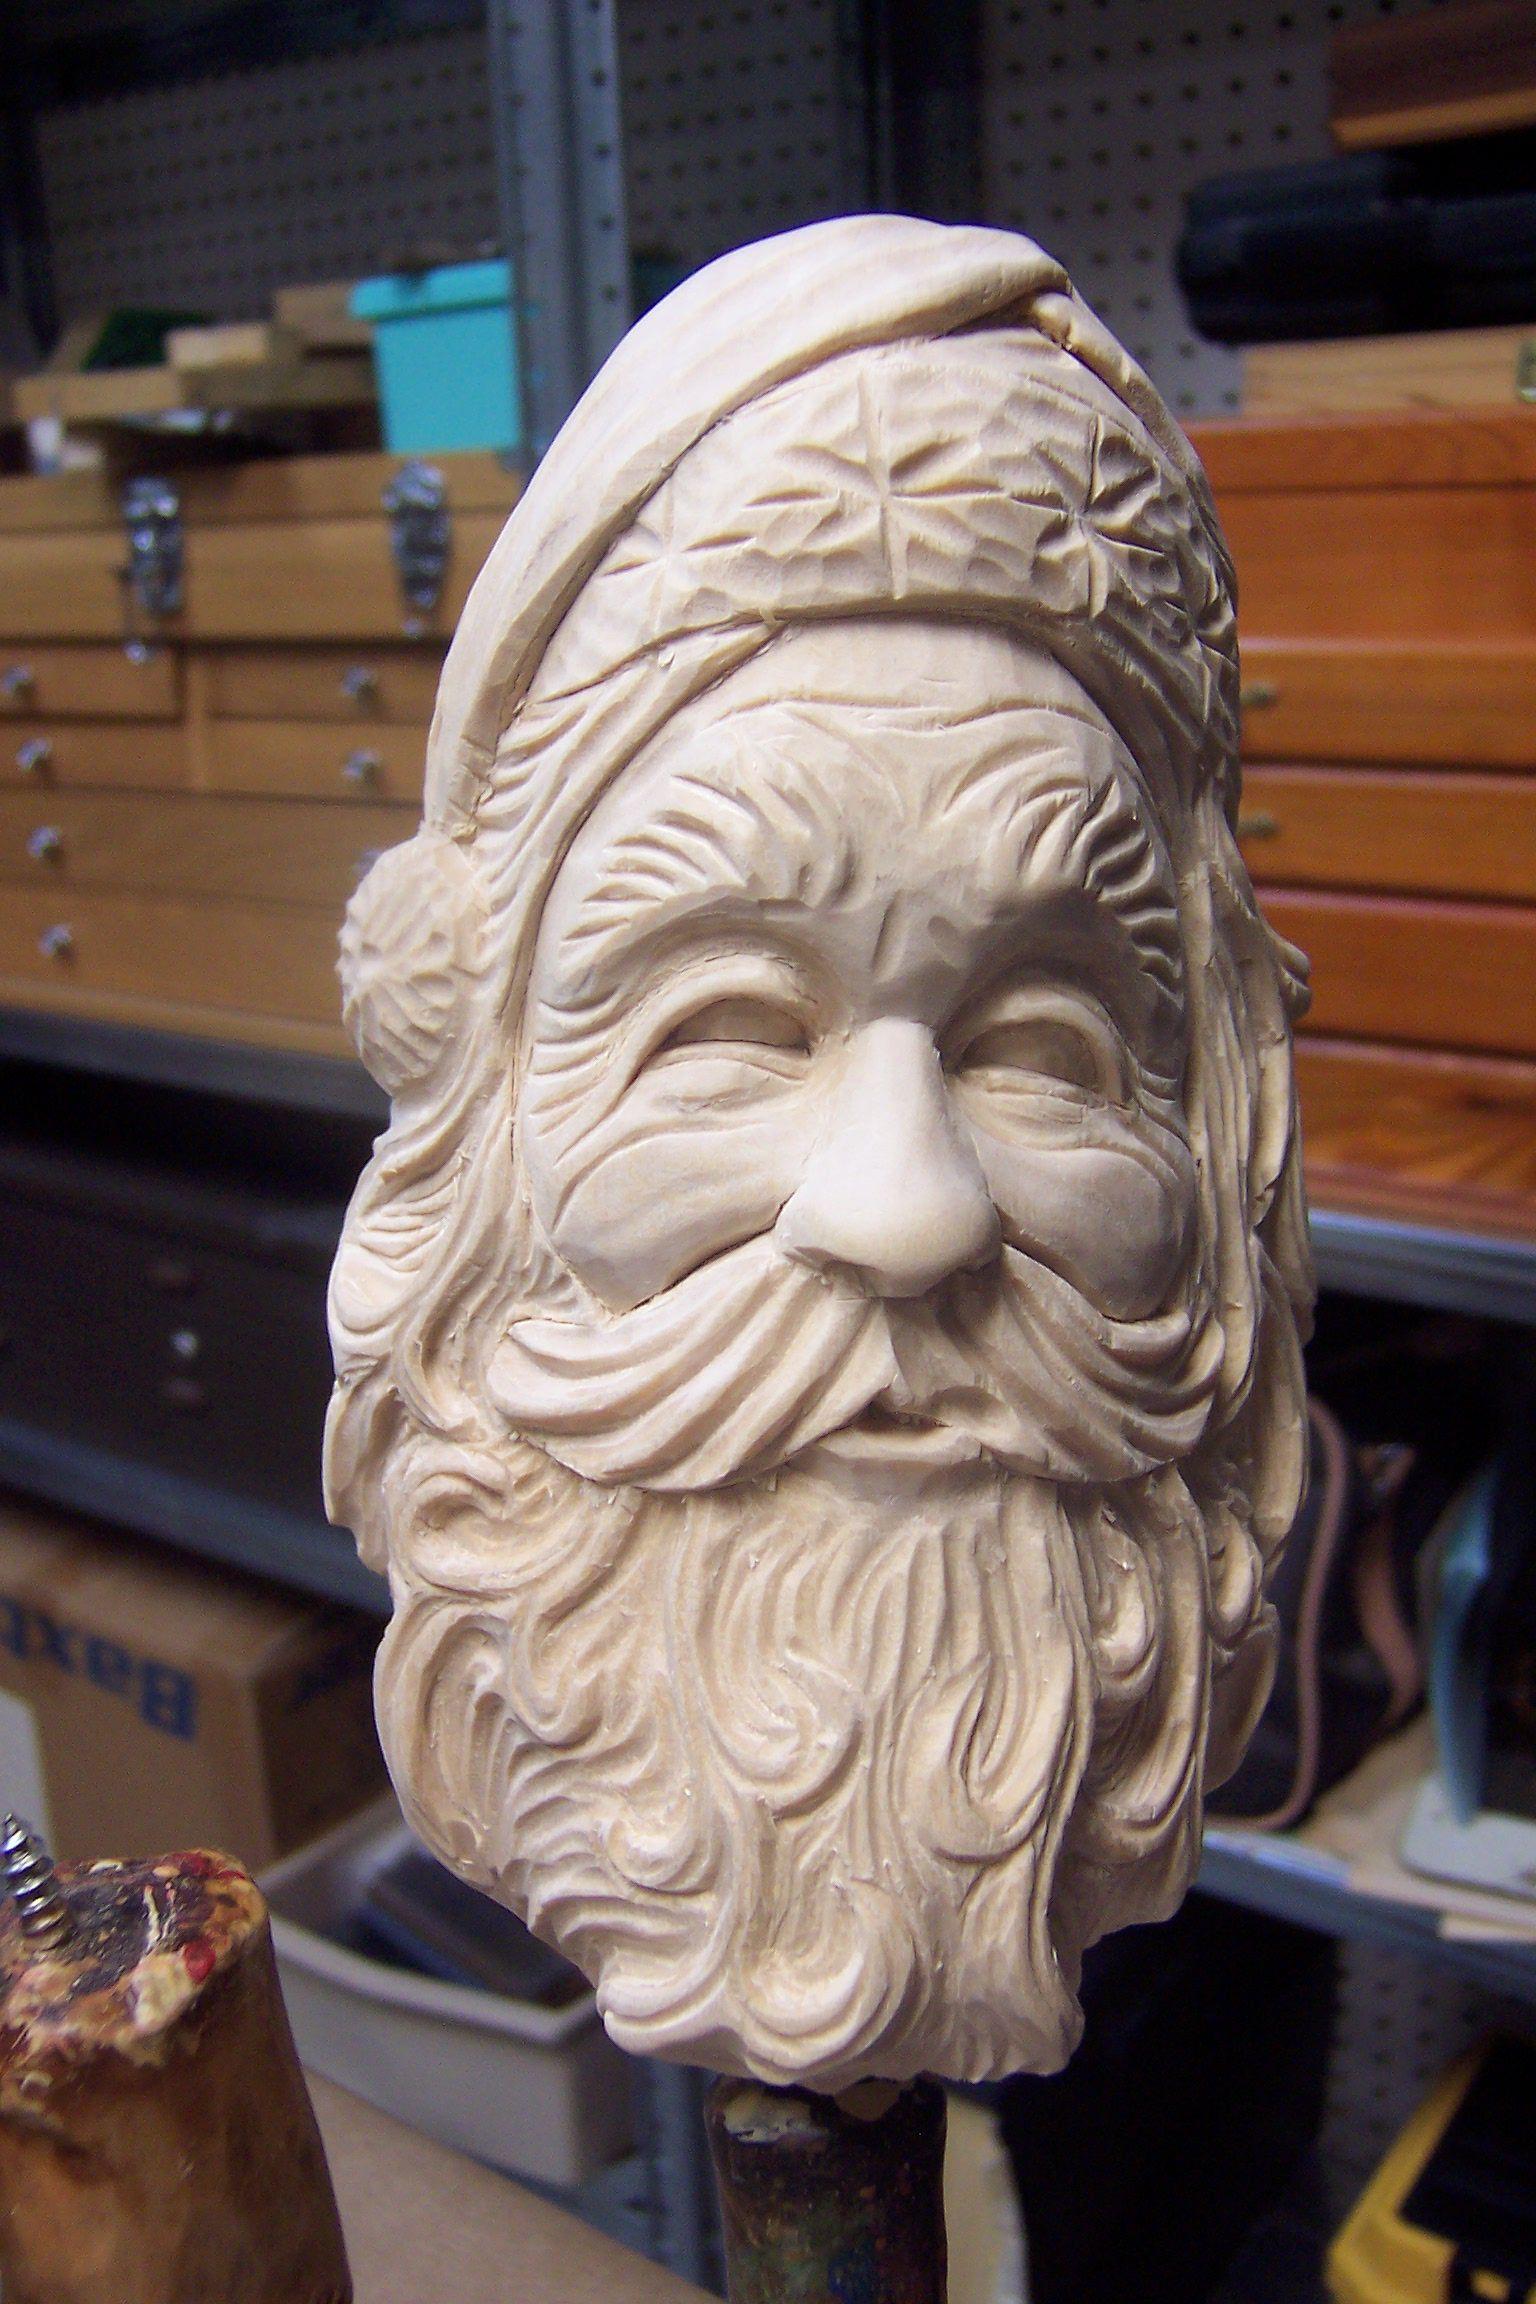 pin by millard harrell on santa faces pinterest woodcarving